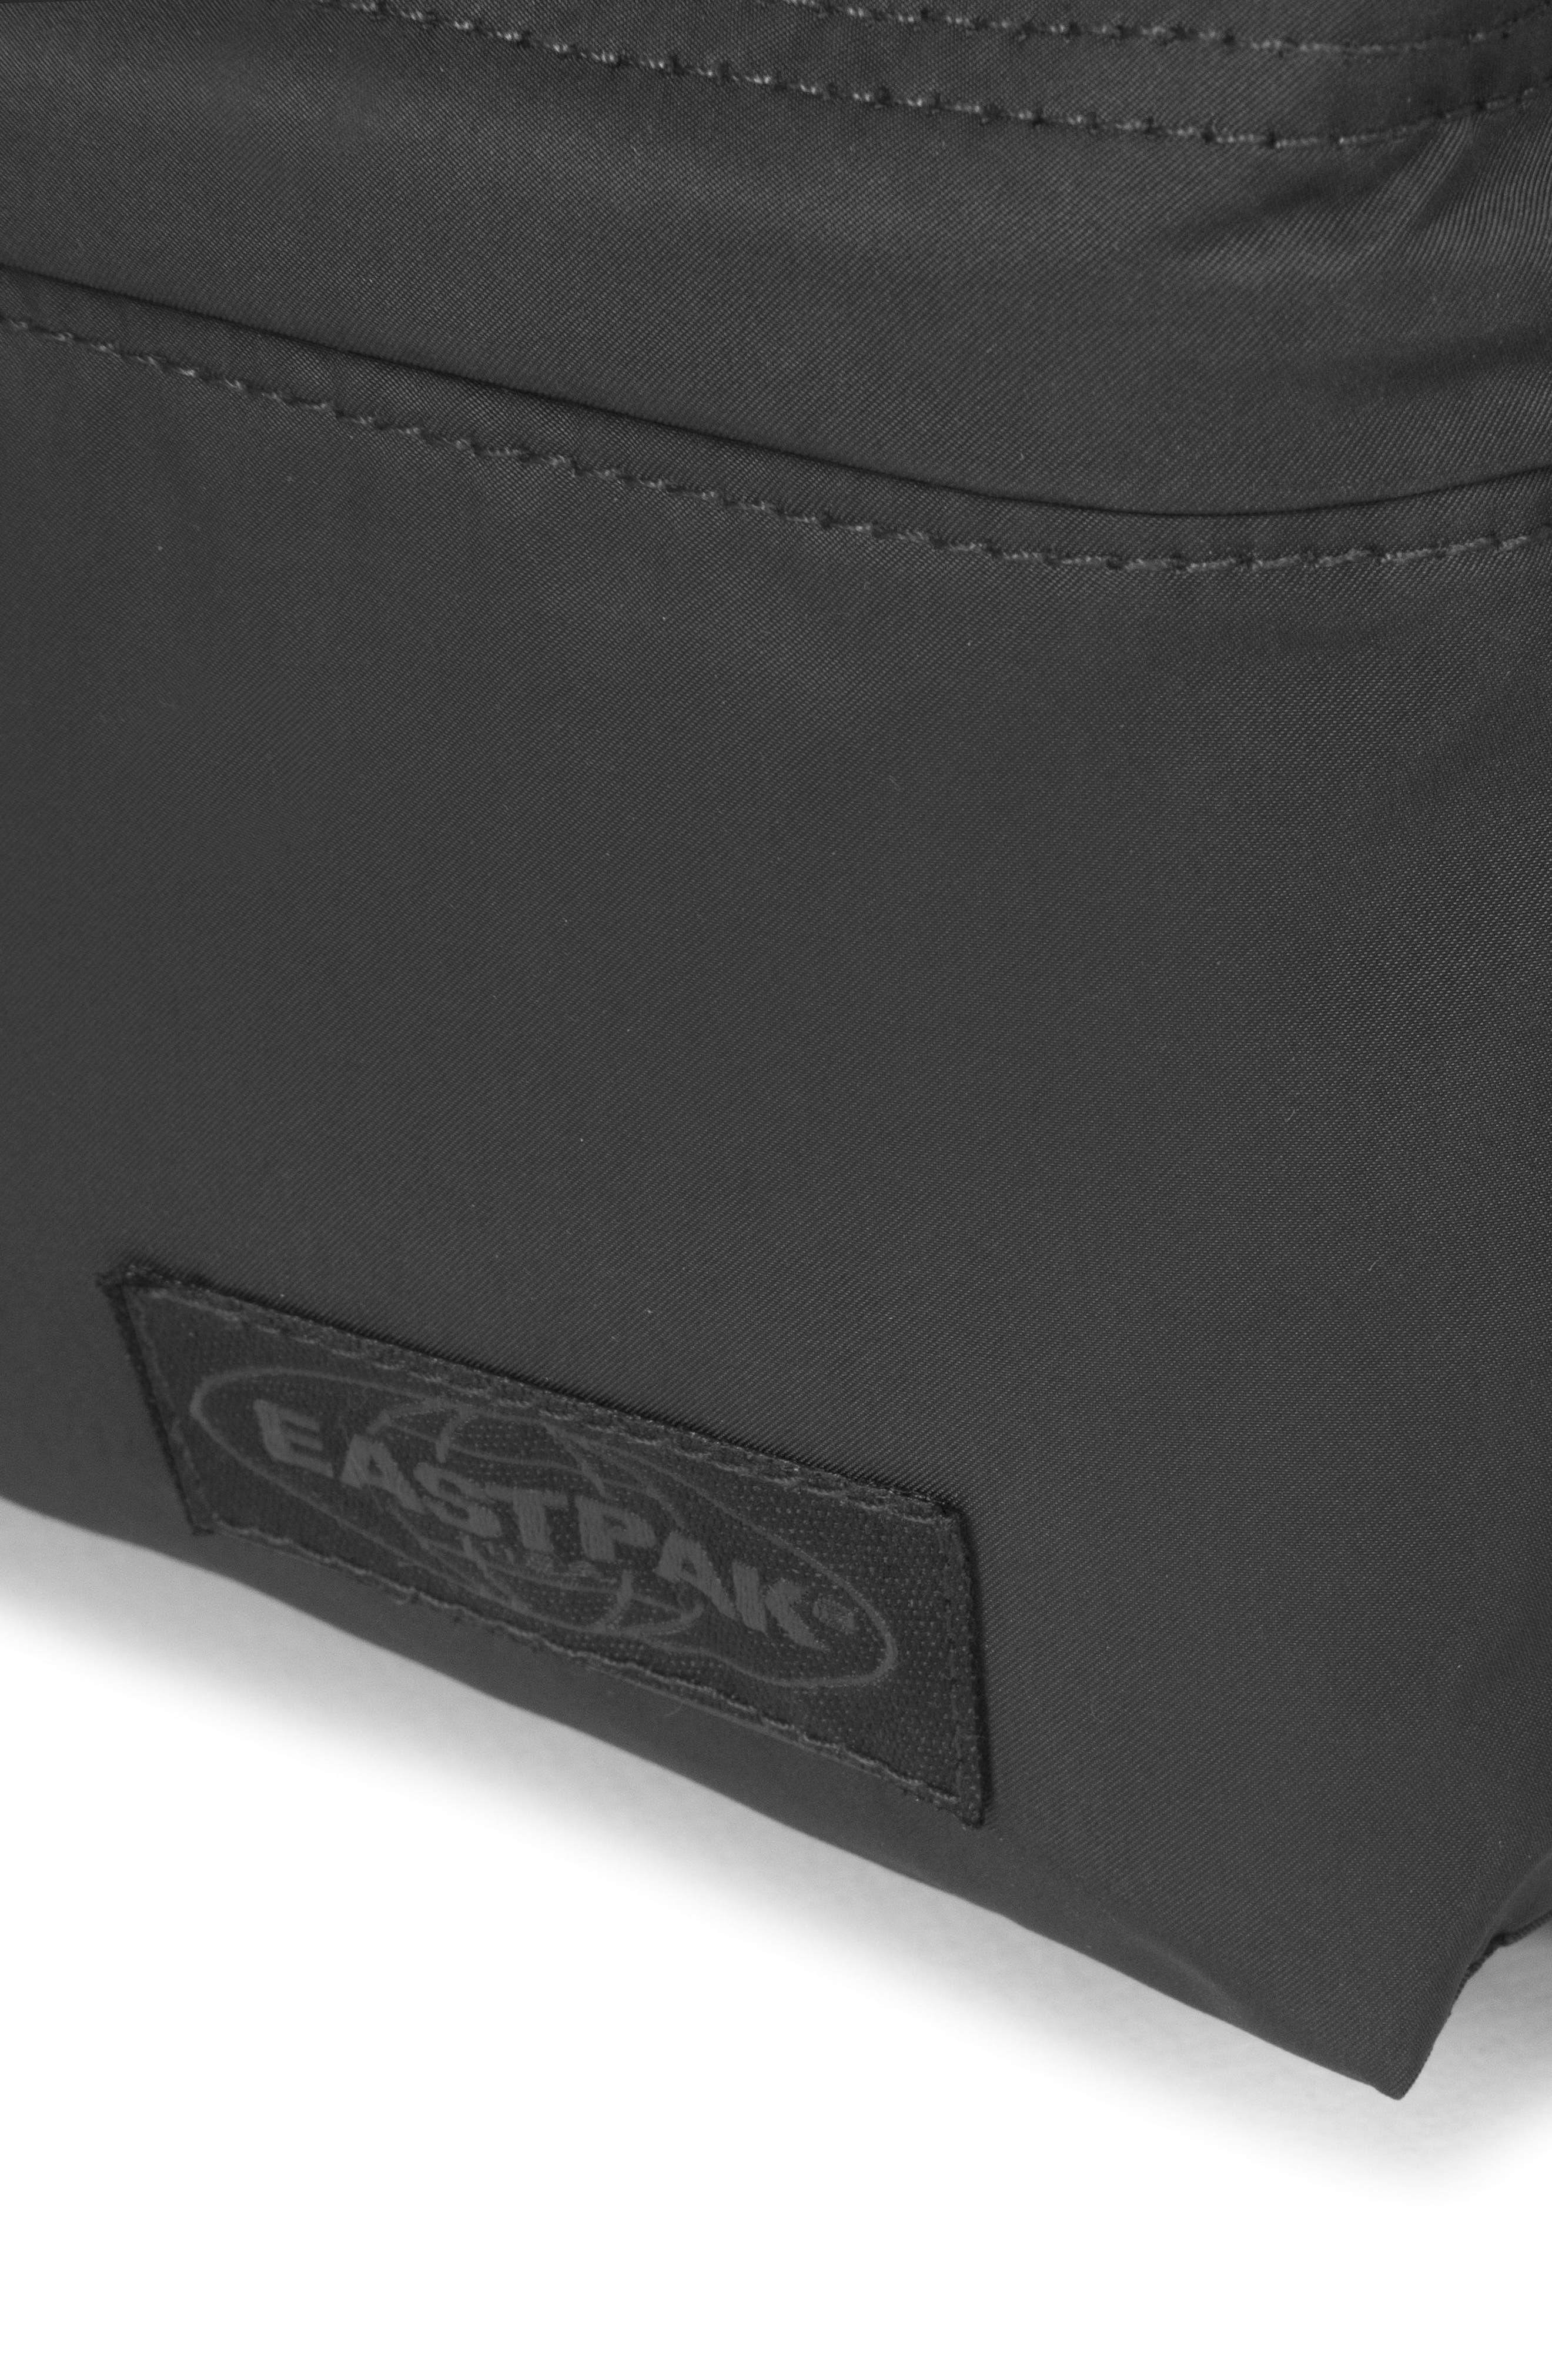 EASTPAK,                             Padded Doubl'r<sup>®</sup> Nylon Backpack,                             Alternate thumbnail 5, color,                             001